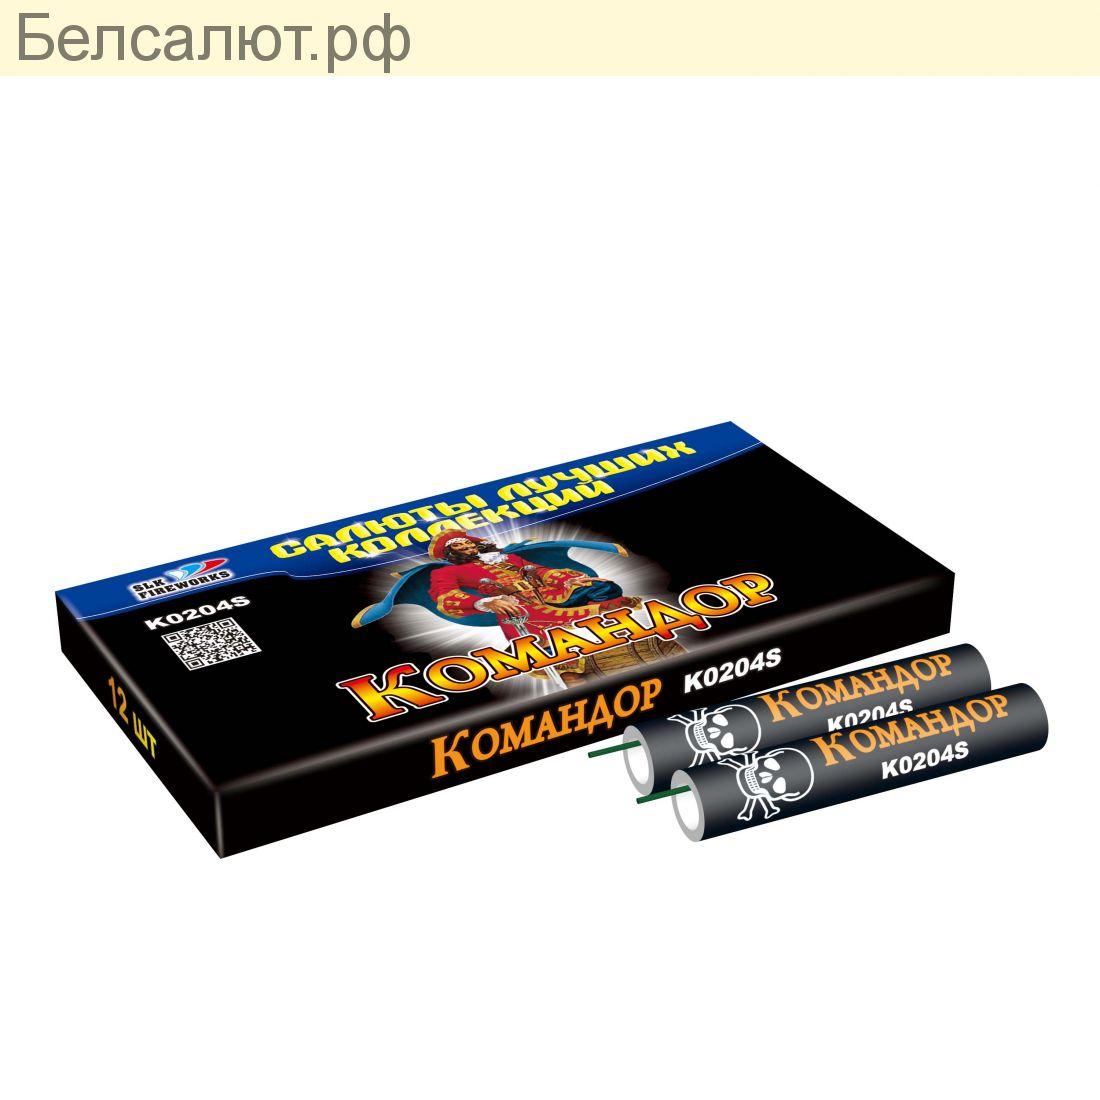 К 0204 S КОМАНДОР